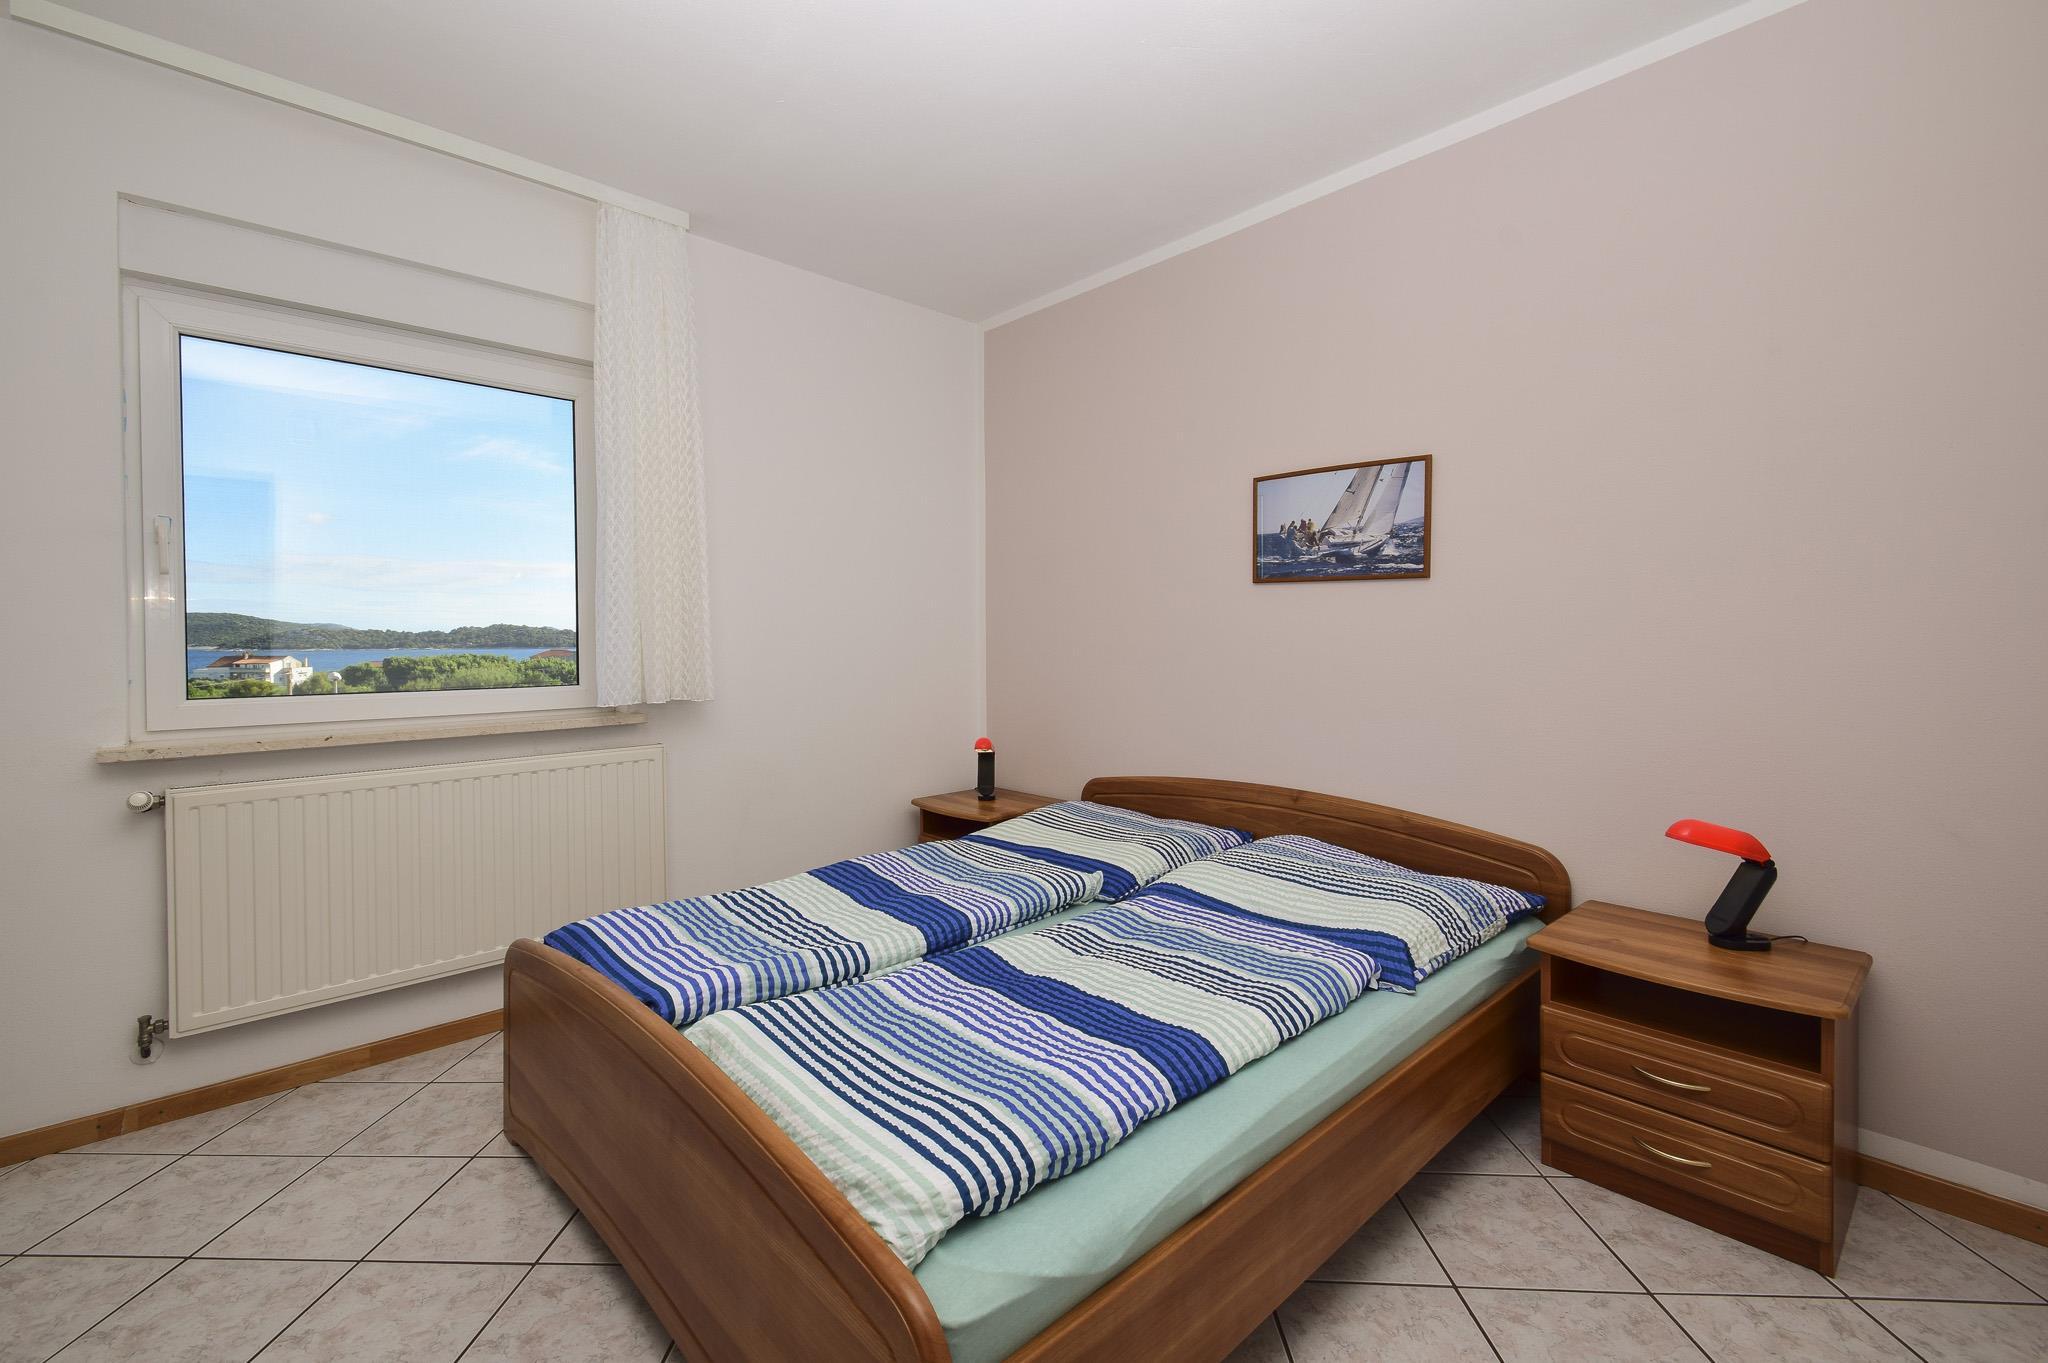 Ferienwohnung Apartments Sanja / Two bedrooms A6 (1928313), Vodice, , Dalmatien, Kroatien, Bild 5